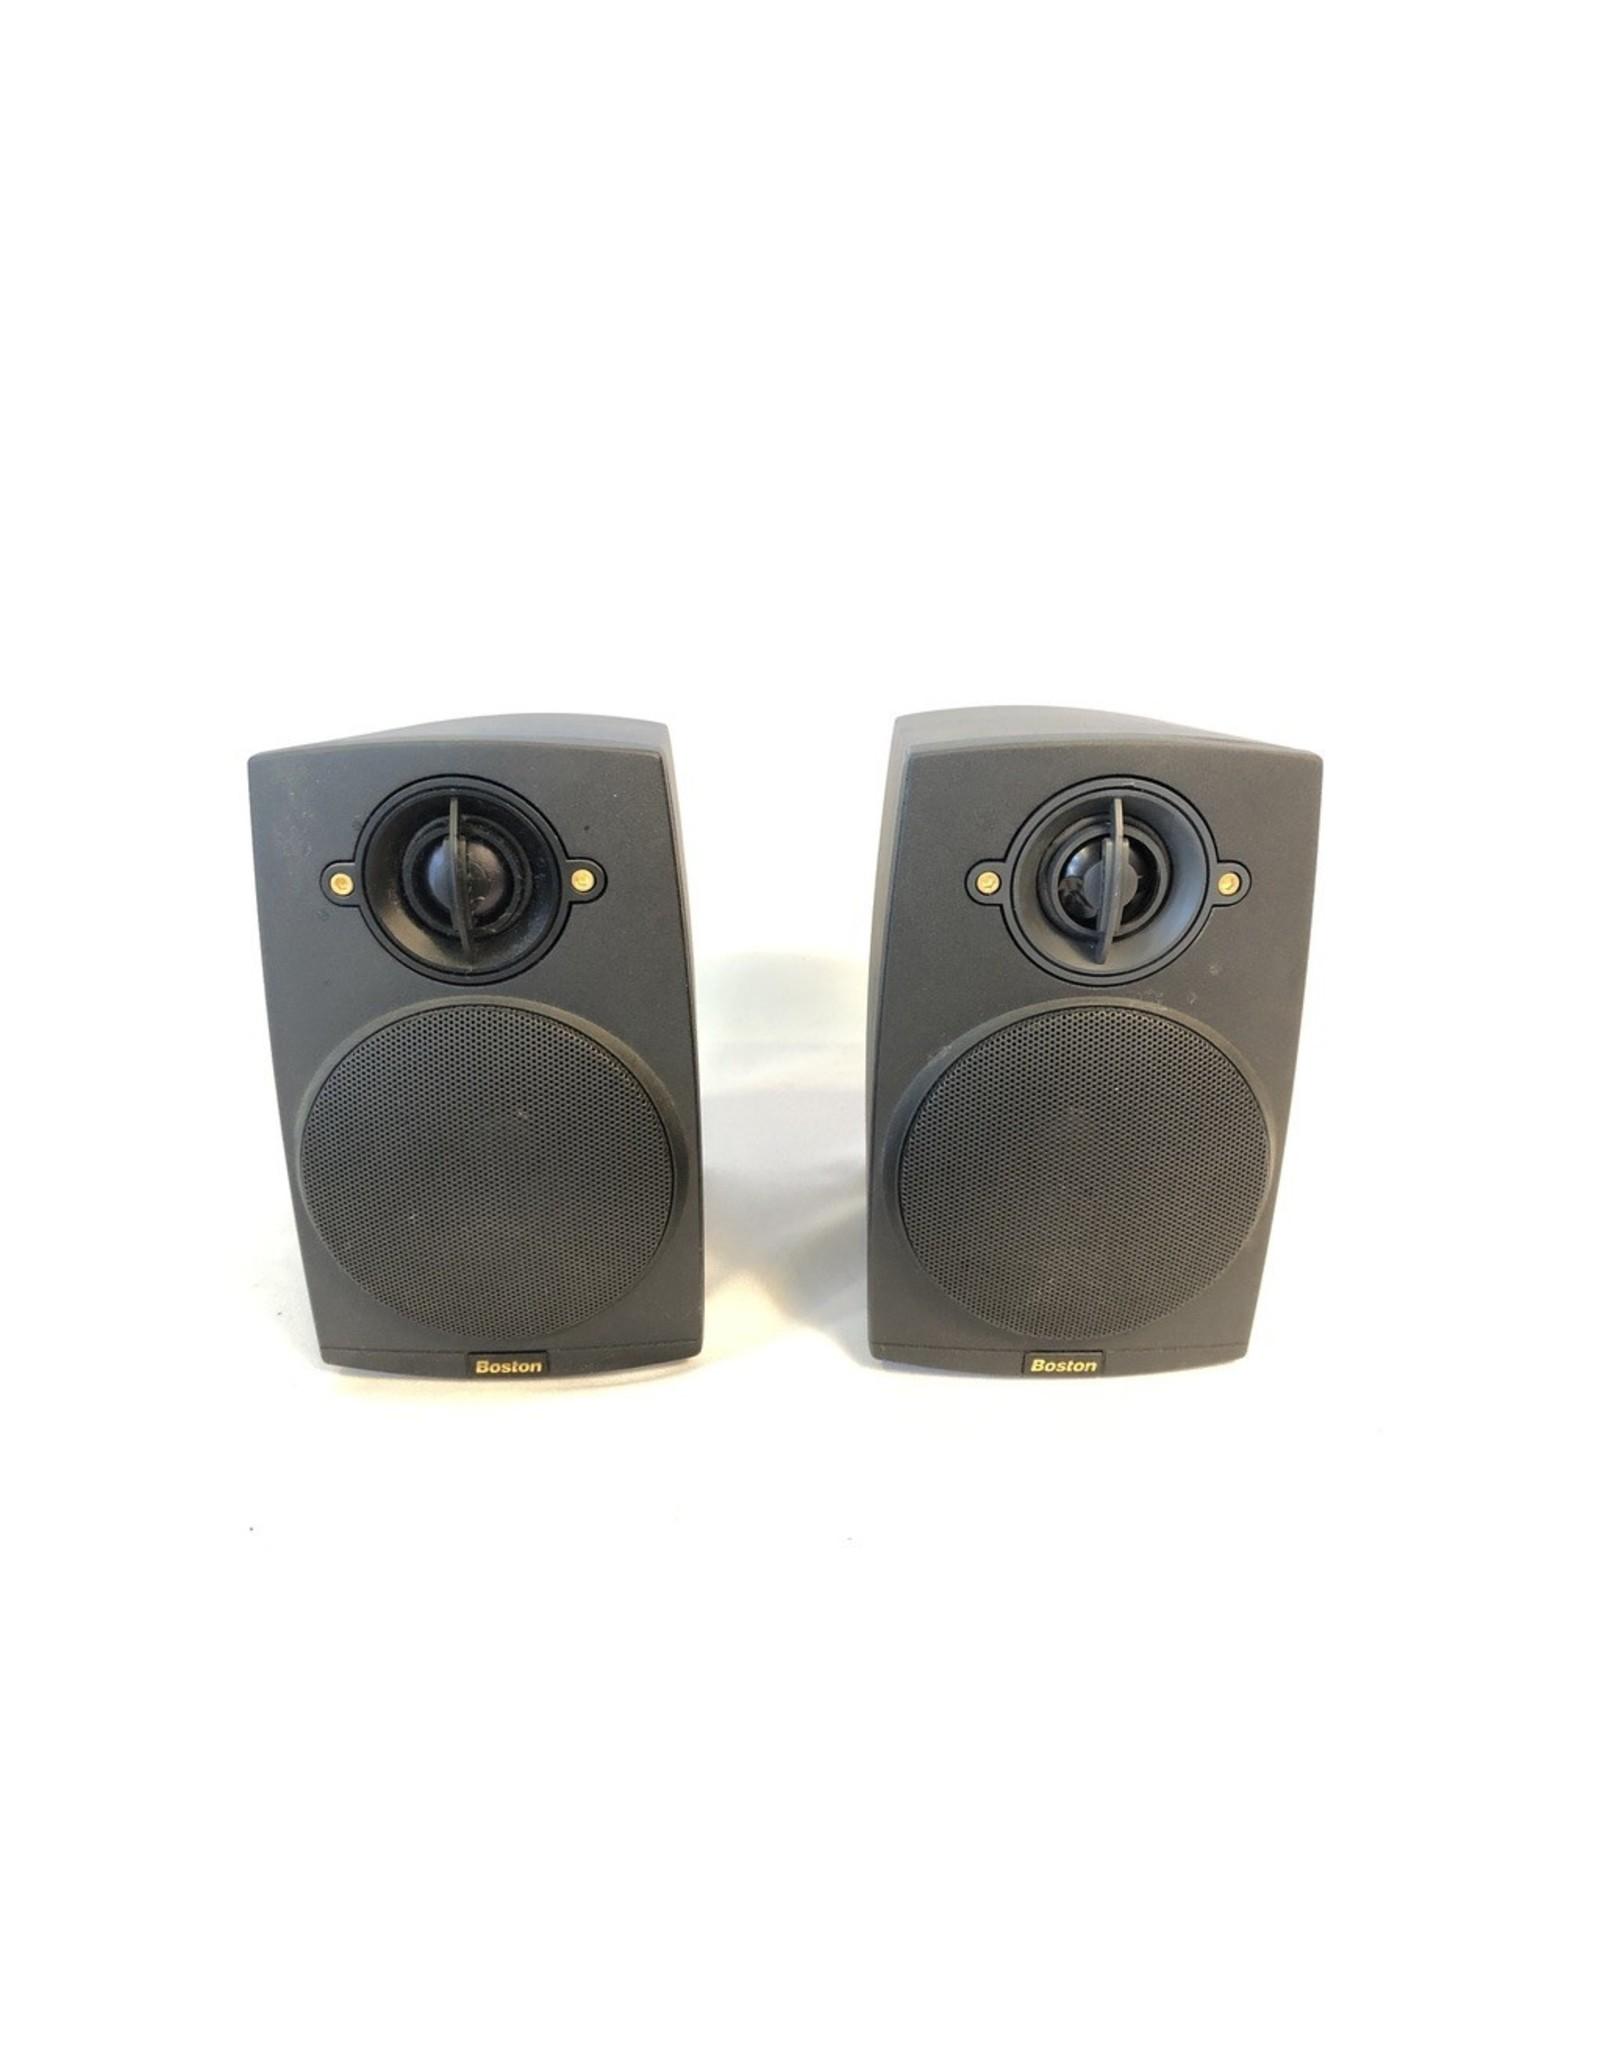 Boston Acoustics Boston Acoustics Micro90x II Bookshelf Speakers USED